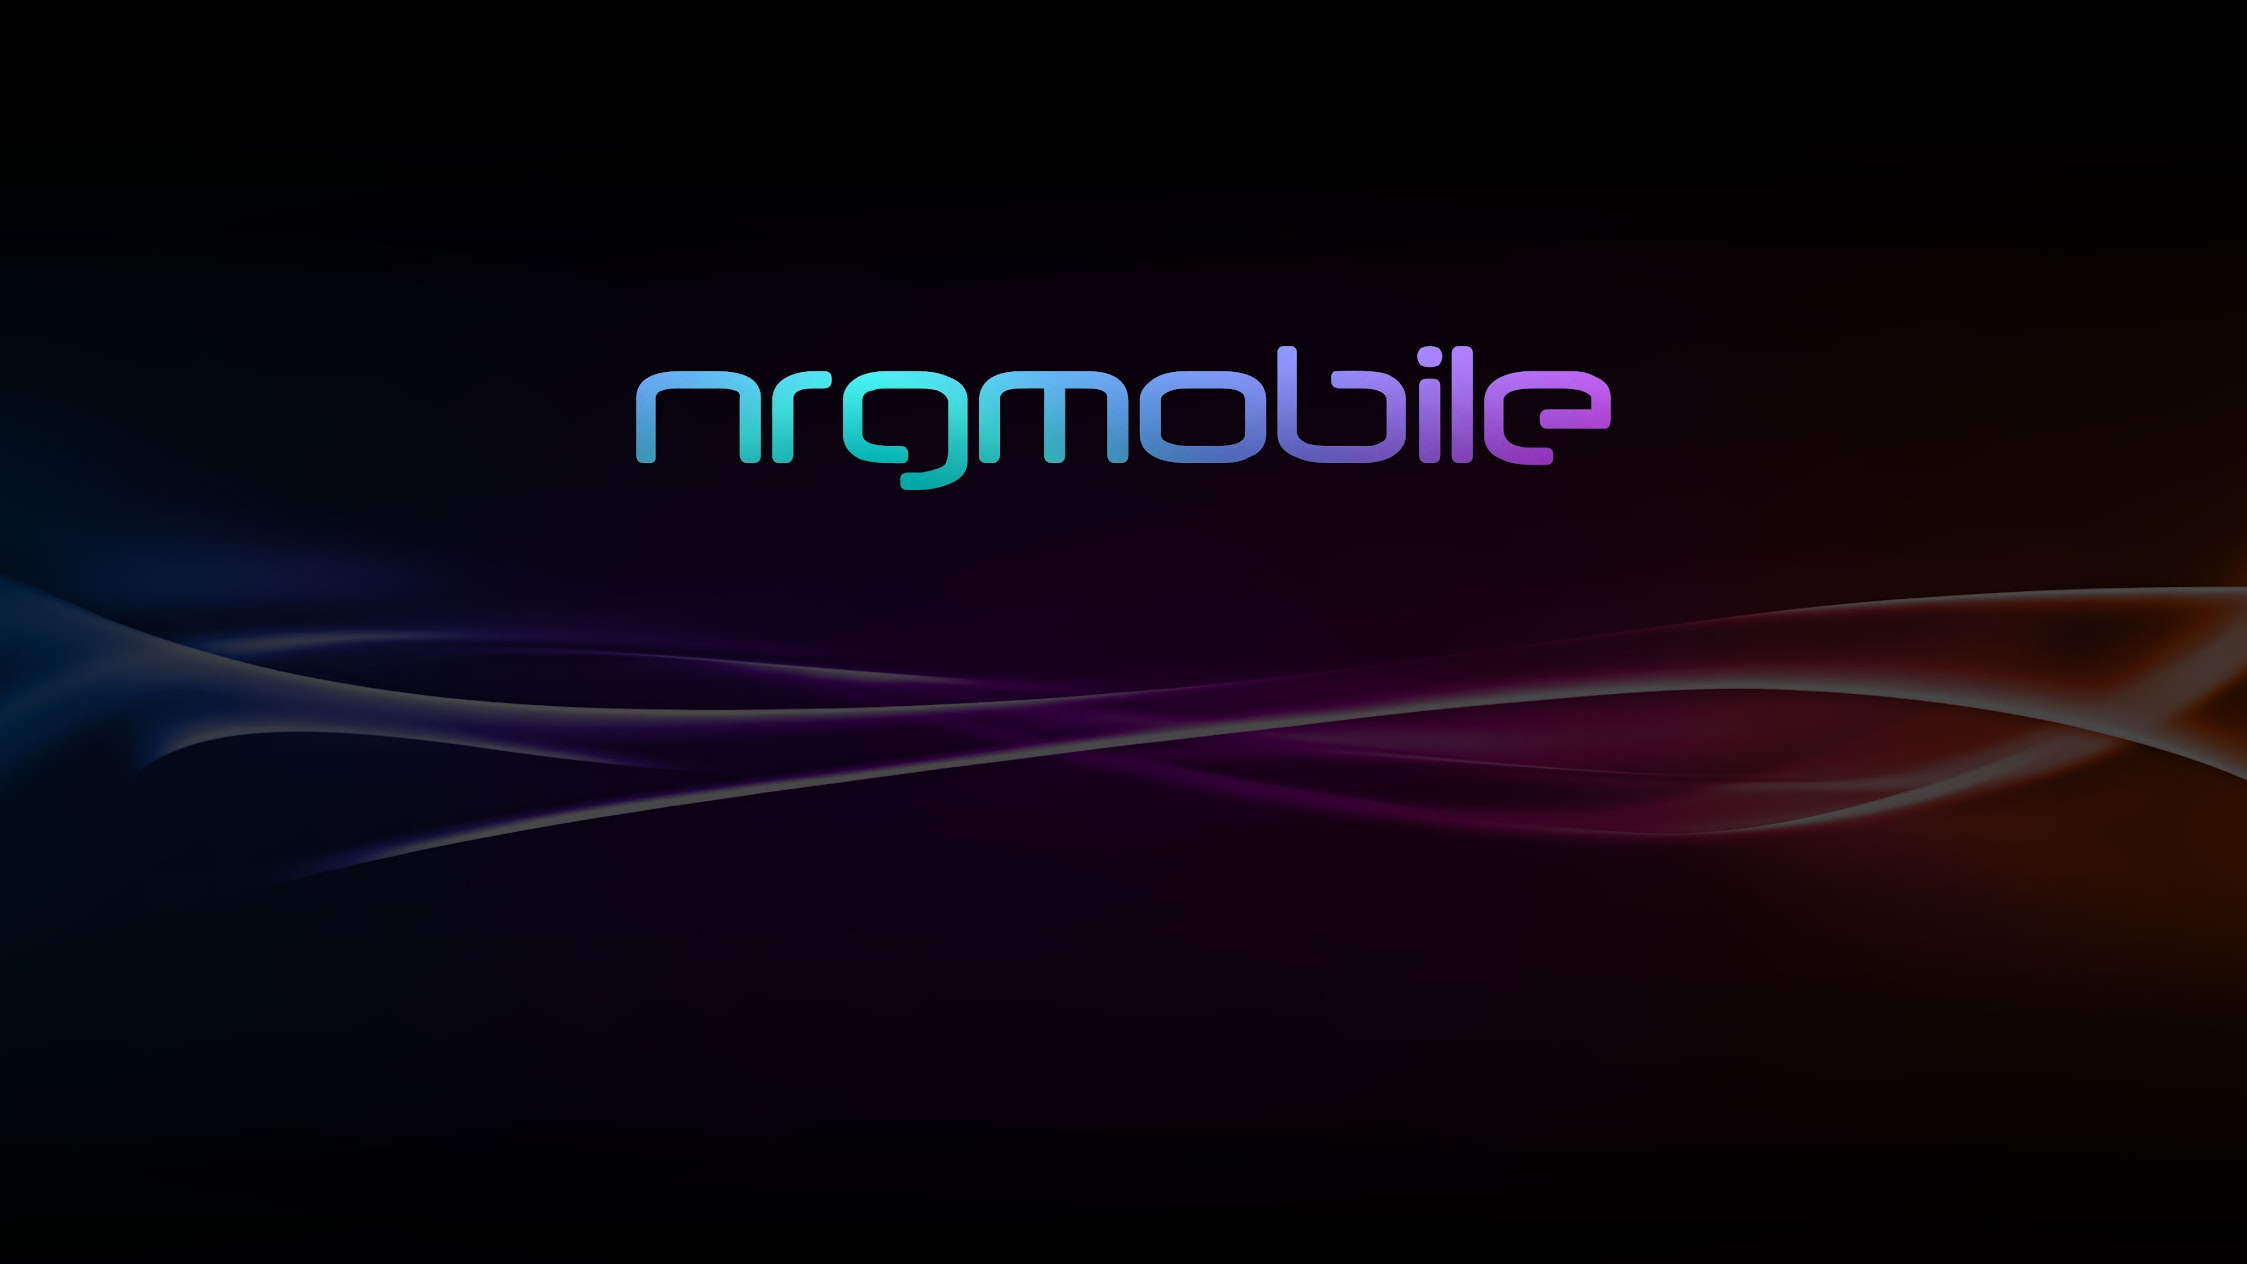 NRG Mobile Software